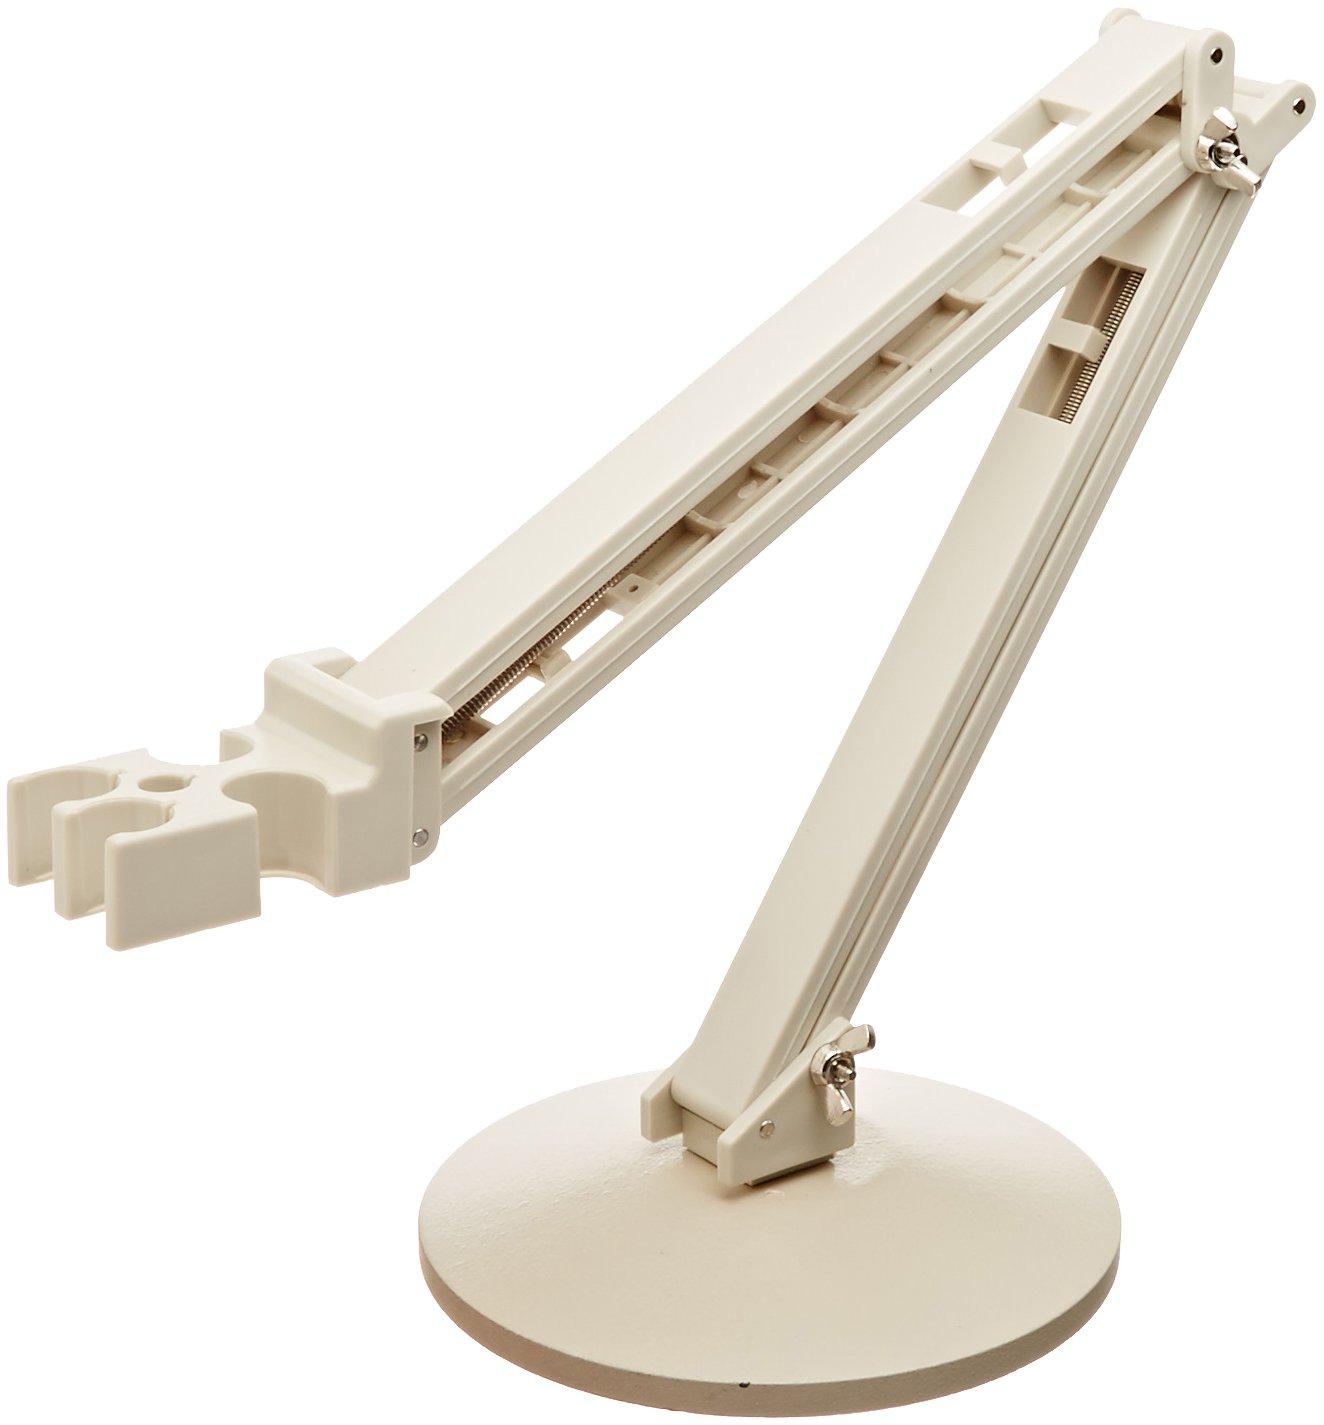 Oakton Instruments WD-35617-50 Electrode Stand, 6'' Diameter Base